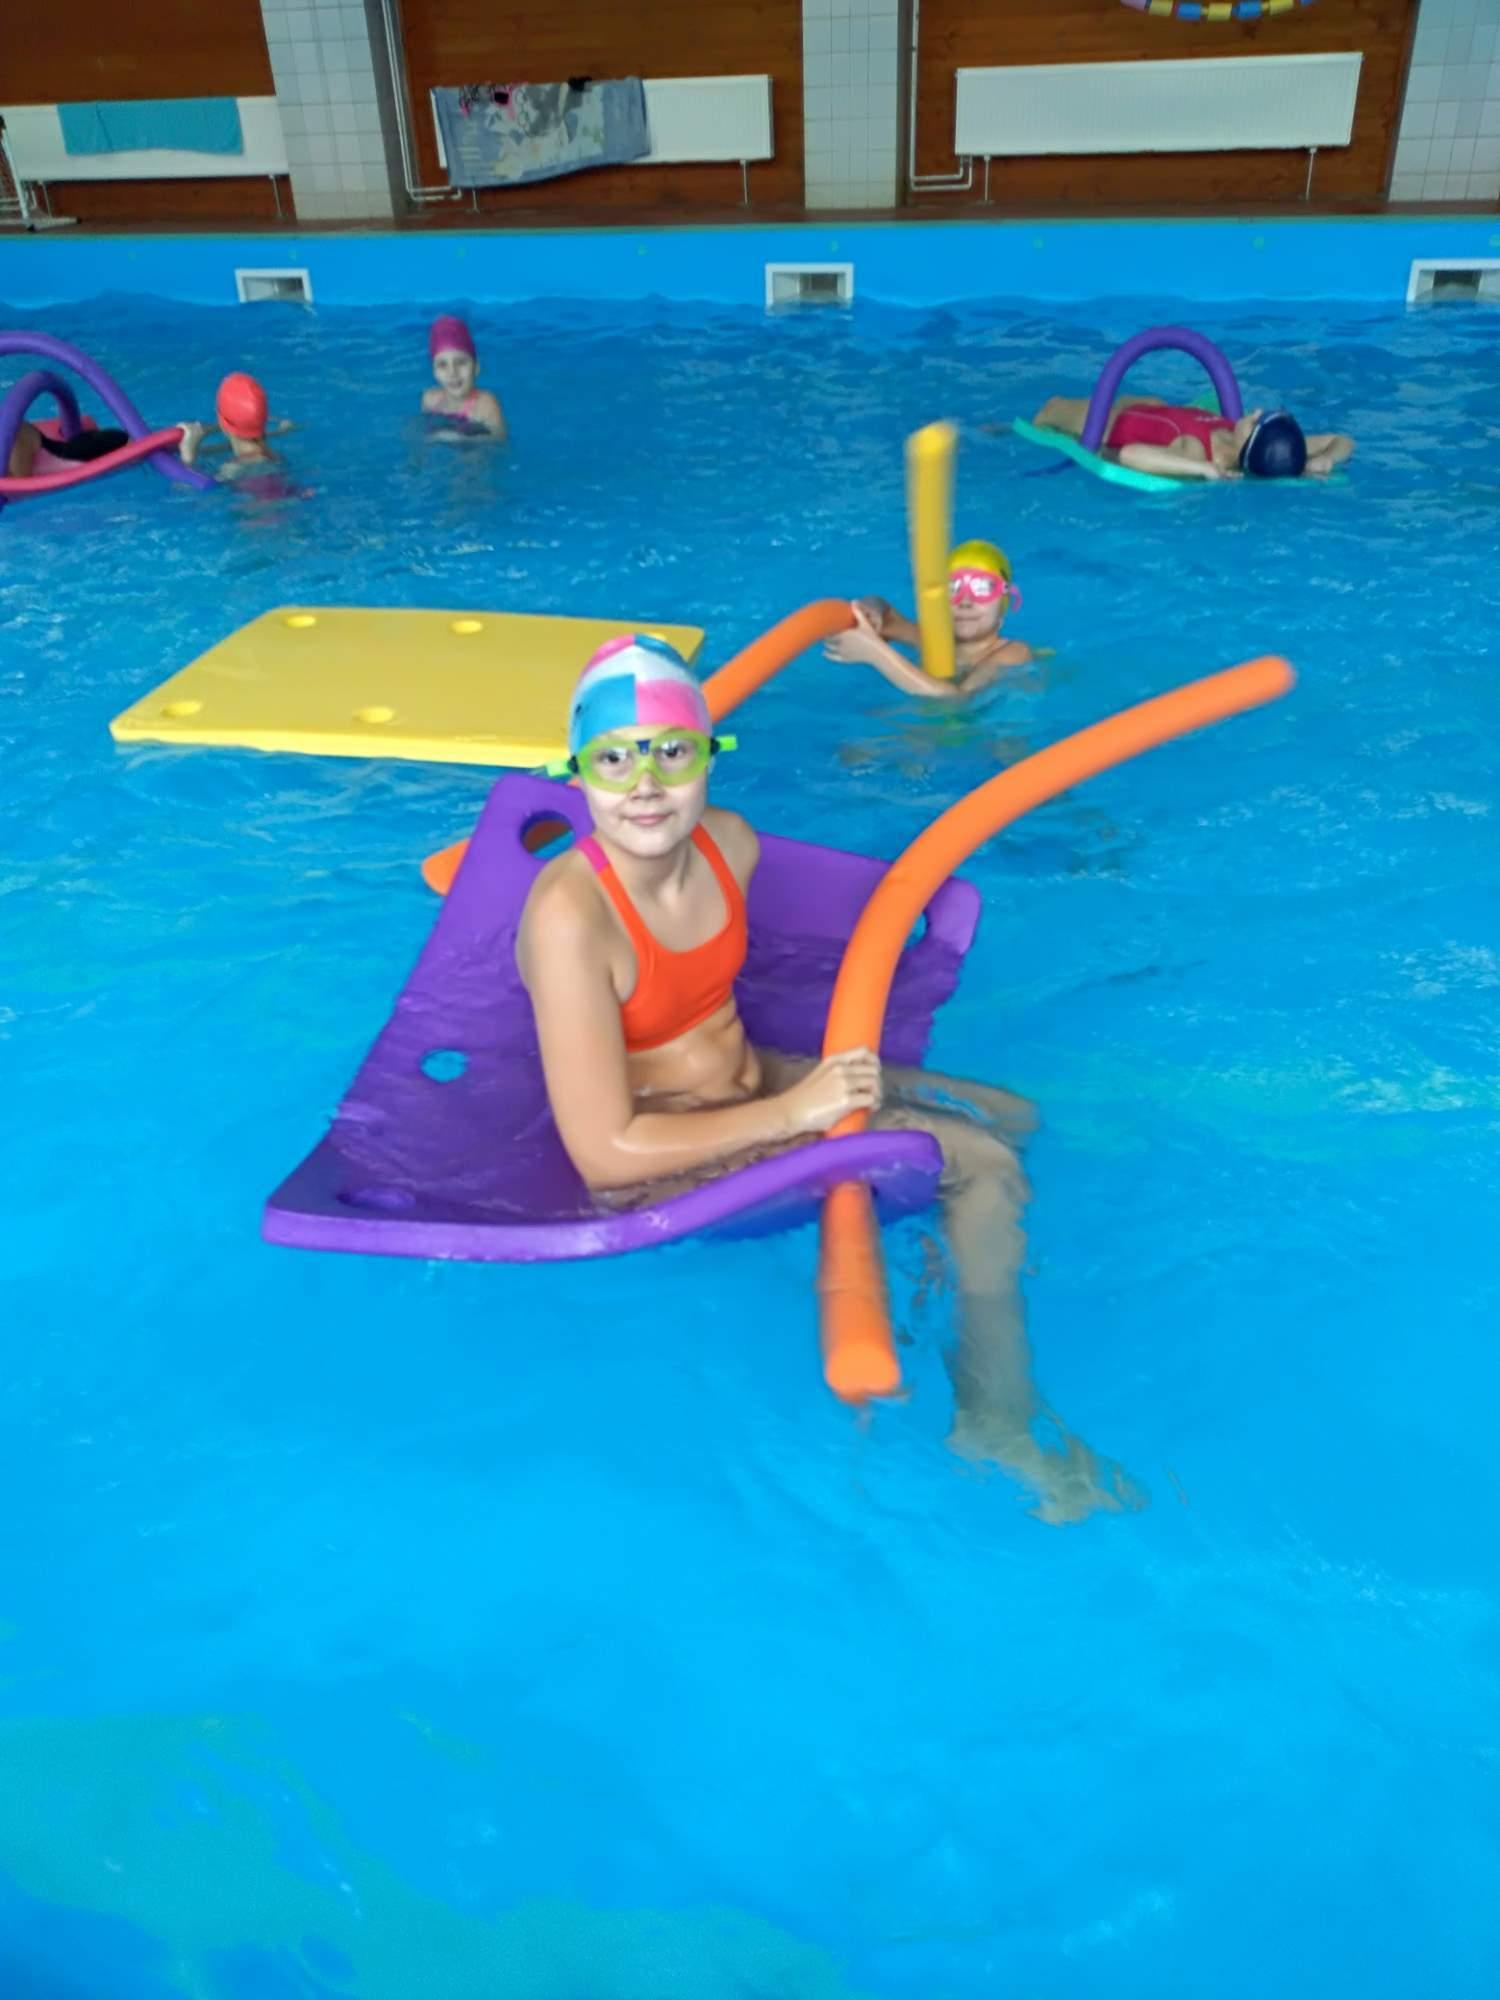 .rajce.idnes.cz swim children